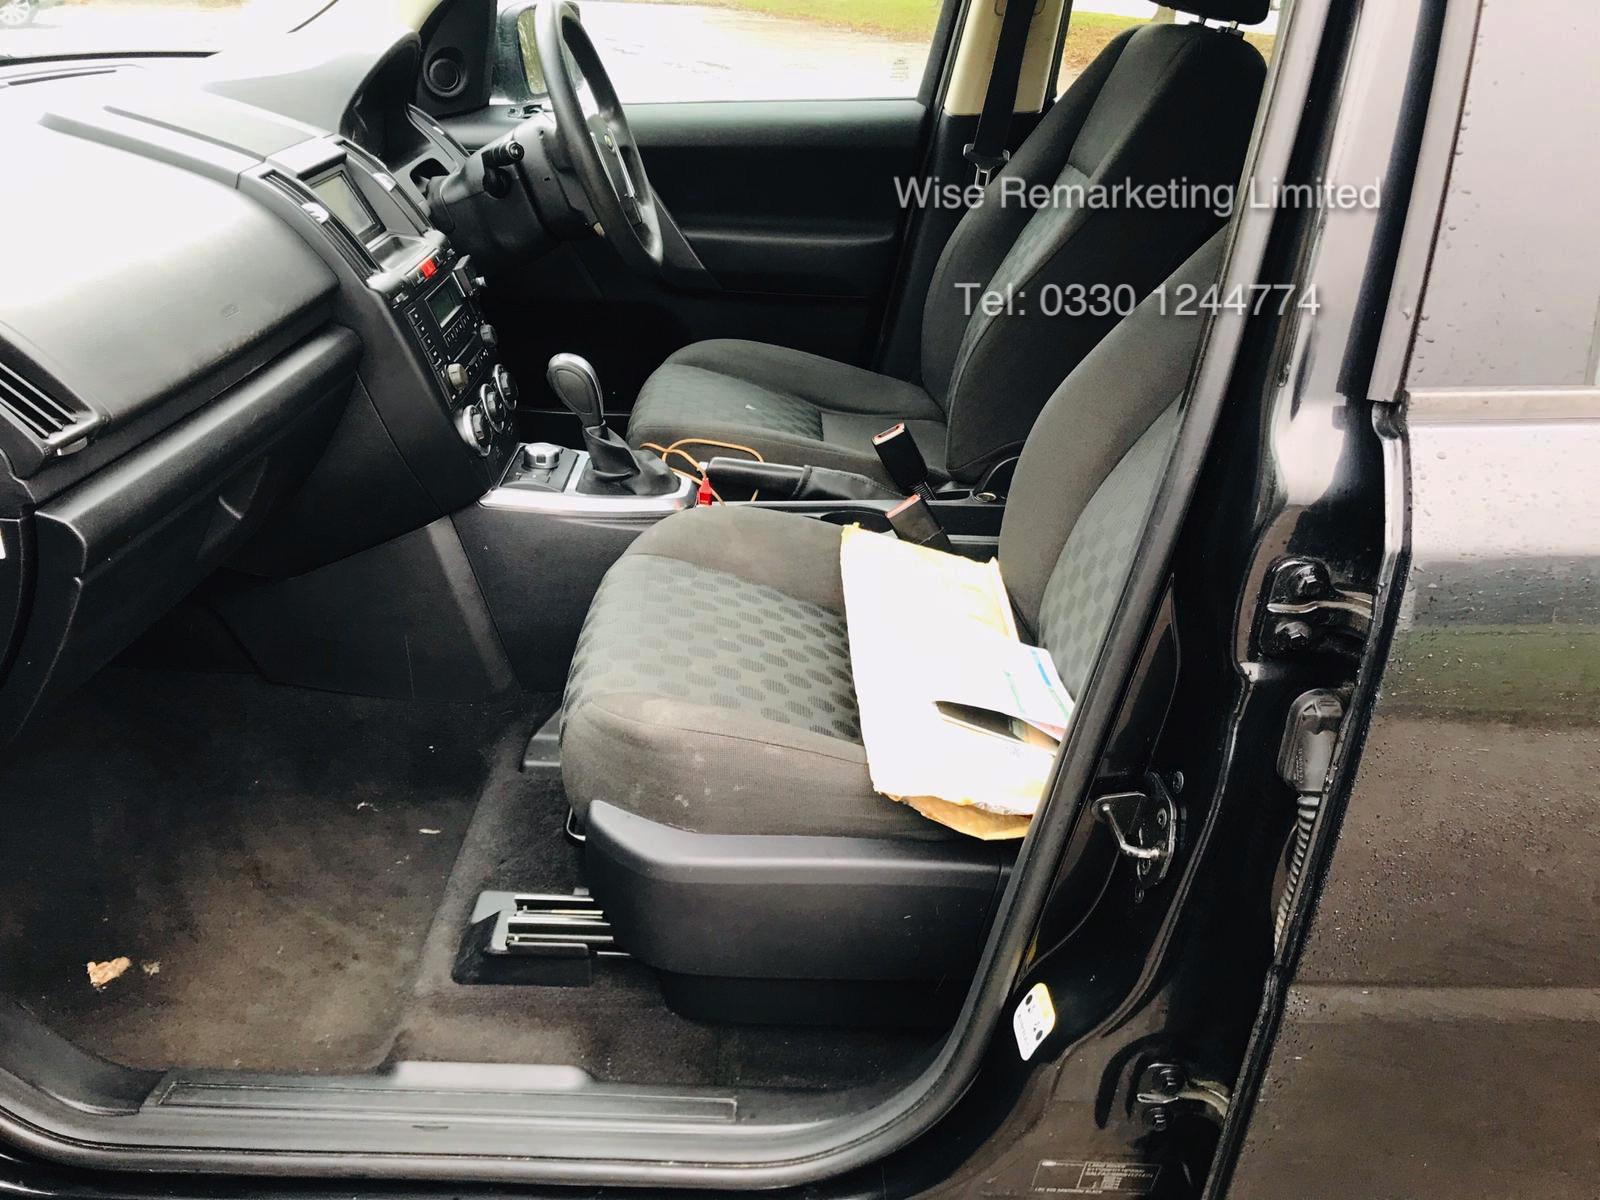 (RESERVE MET)Land Rover Freelander GS 2.2 TD4 Auto - 2009 09 Reg - Service History - Sat Nav - Image 10 of 27